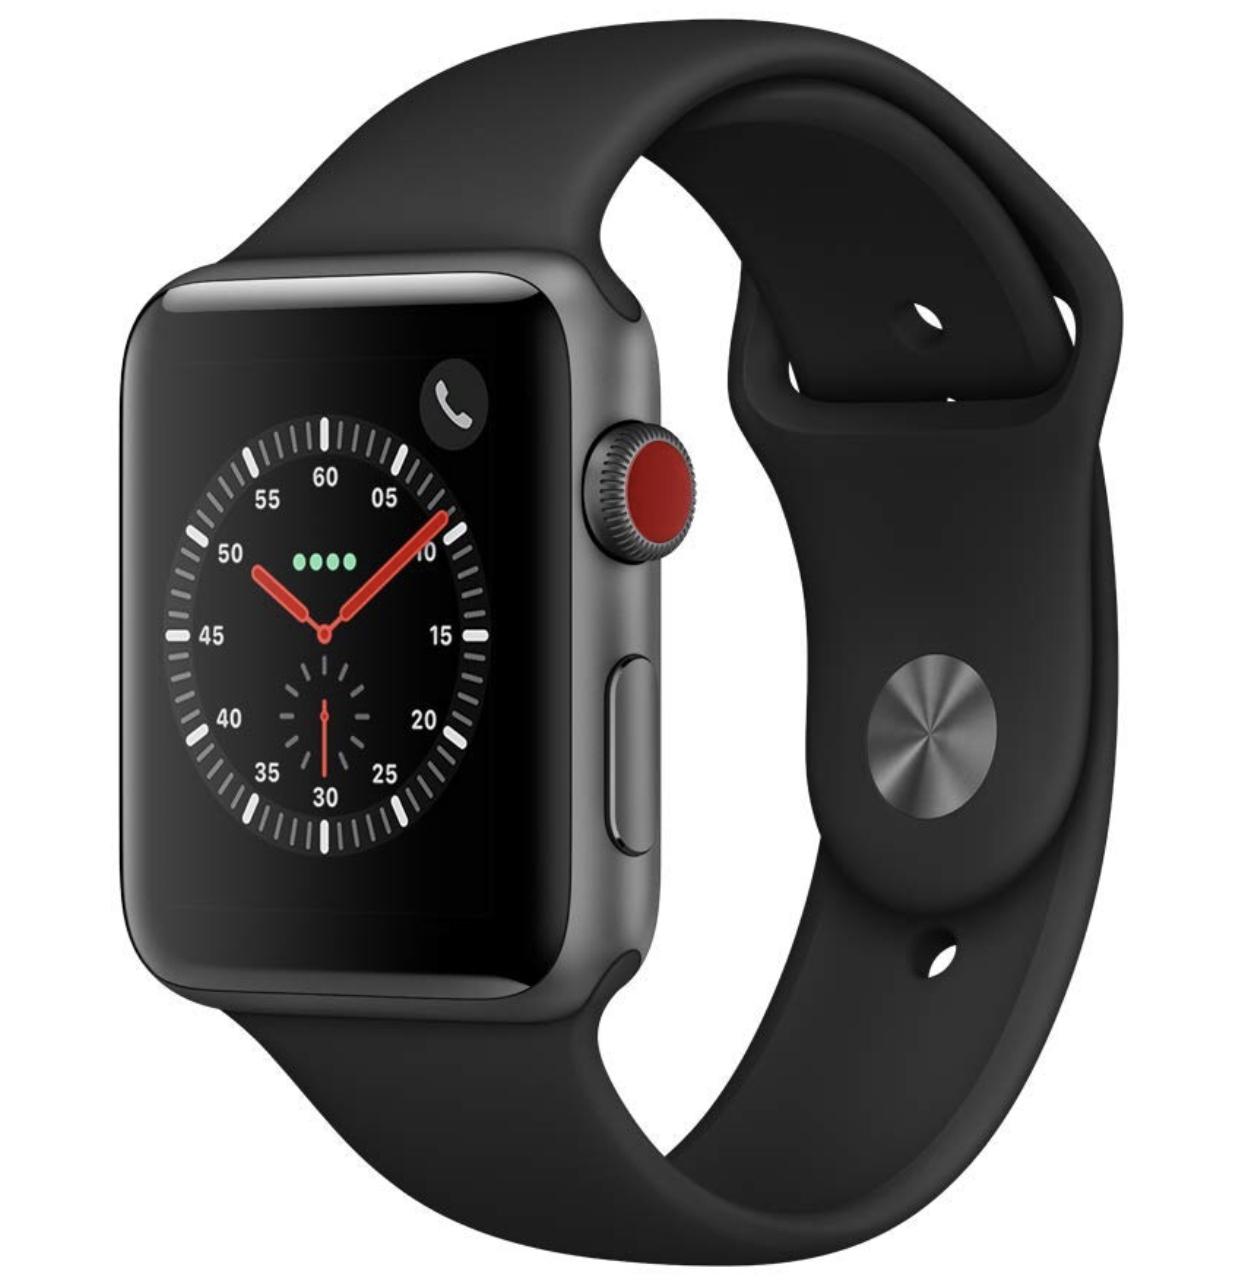 Apple Watch Series 3 (GPS + Cellular) 42 mm Aluminiumgehäuse, Space Grau, mit Sportarmband, Schwarz